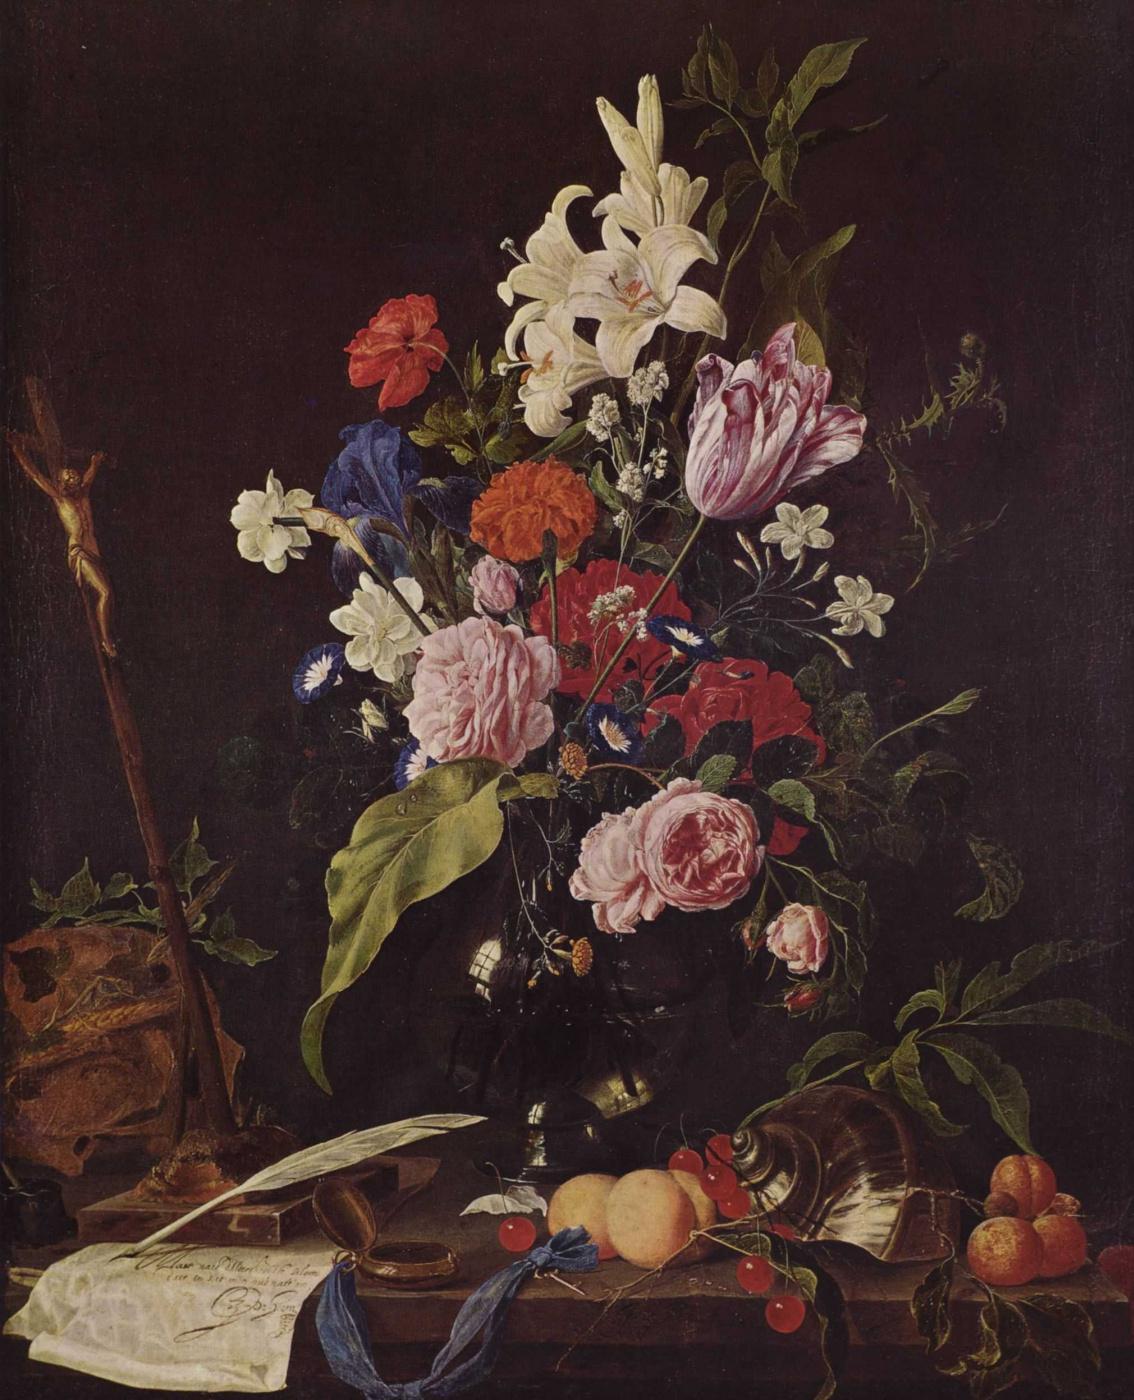 Jan Davids de Hem. Flowers in glass vase, crucifix and skull